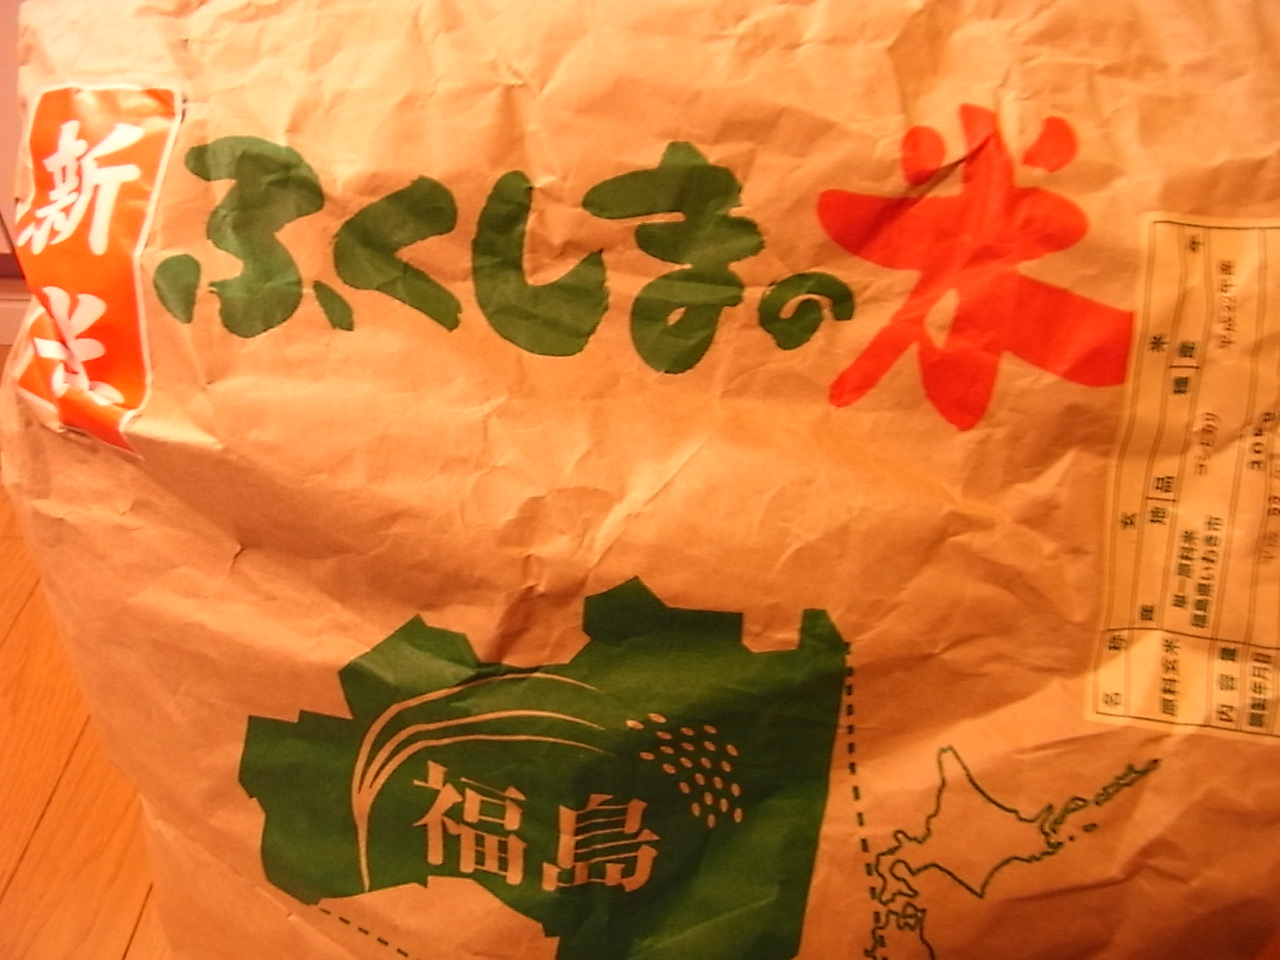 http://susumufukuzaki.com/this_is_not_a_dugudagii_blog/fuku.JPG